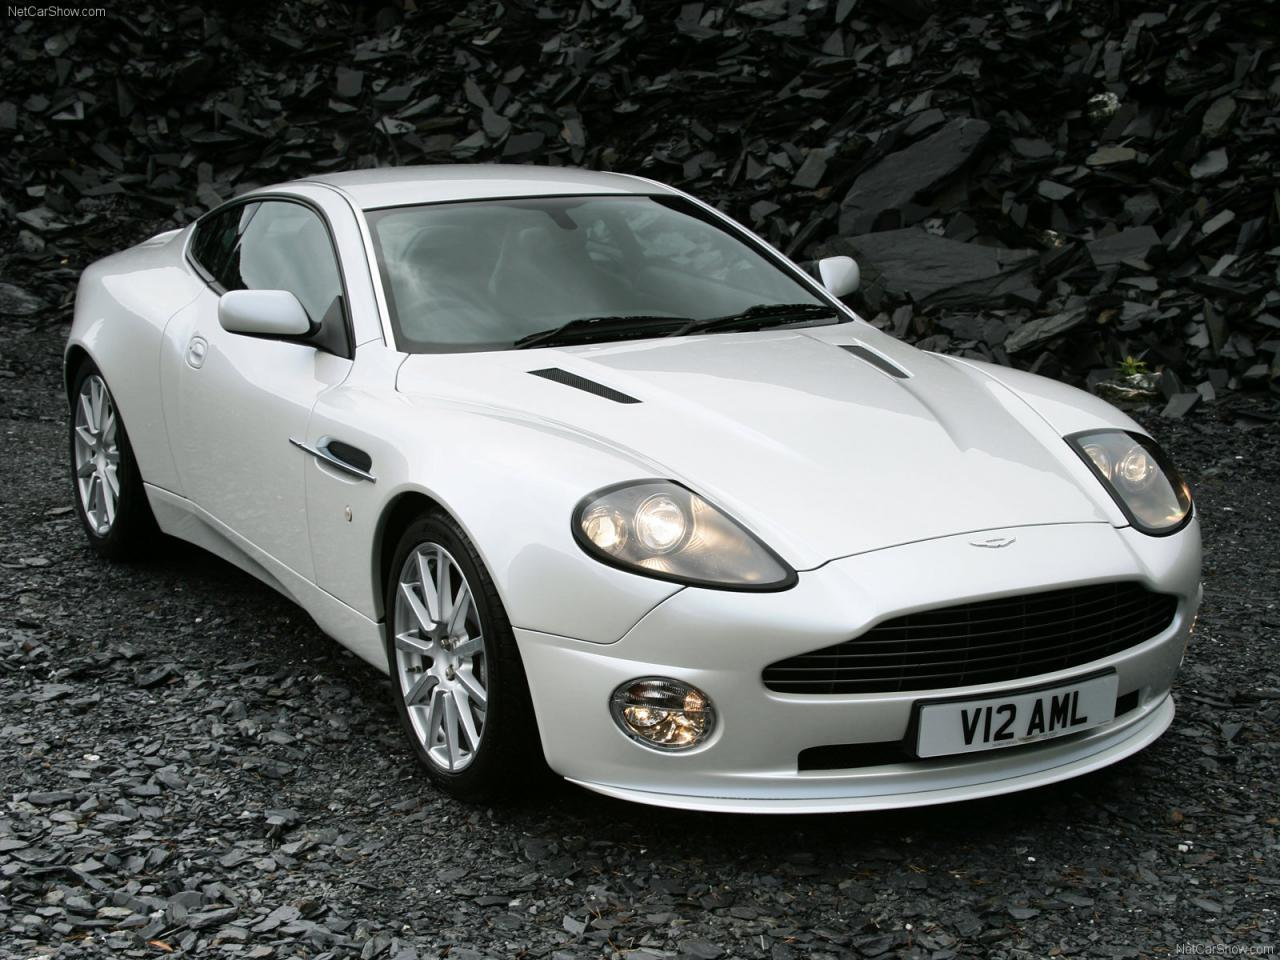 Aston Martin Vanquish Buying Guide - 2001 aston martin vanquish